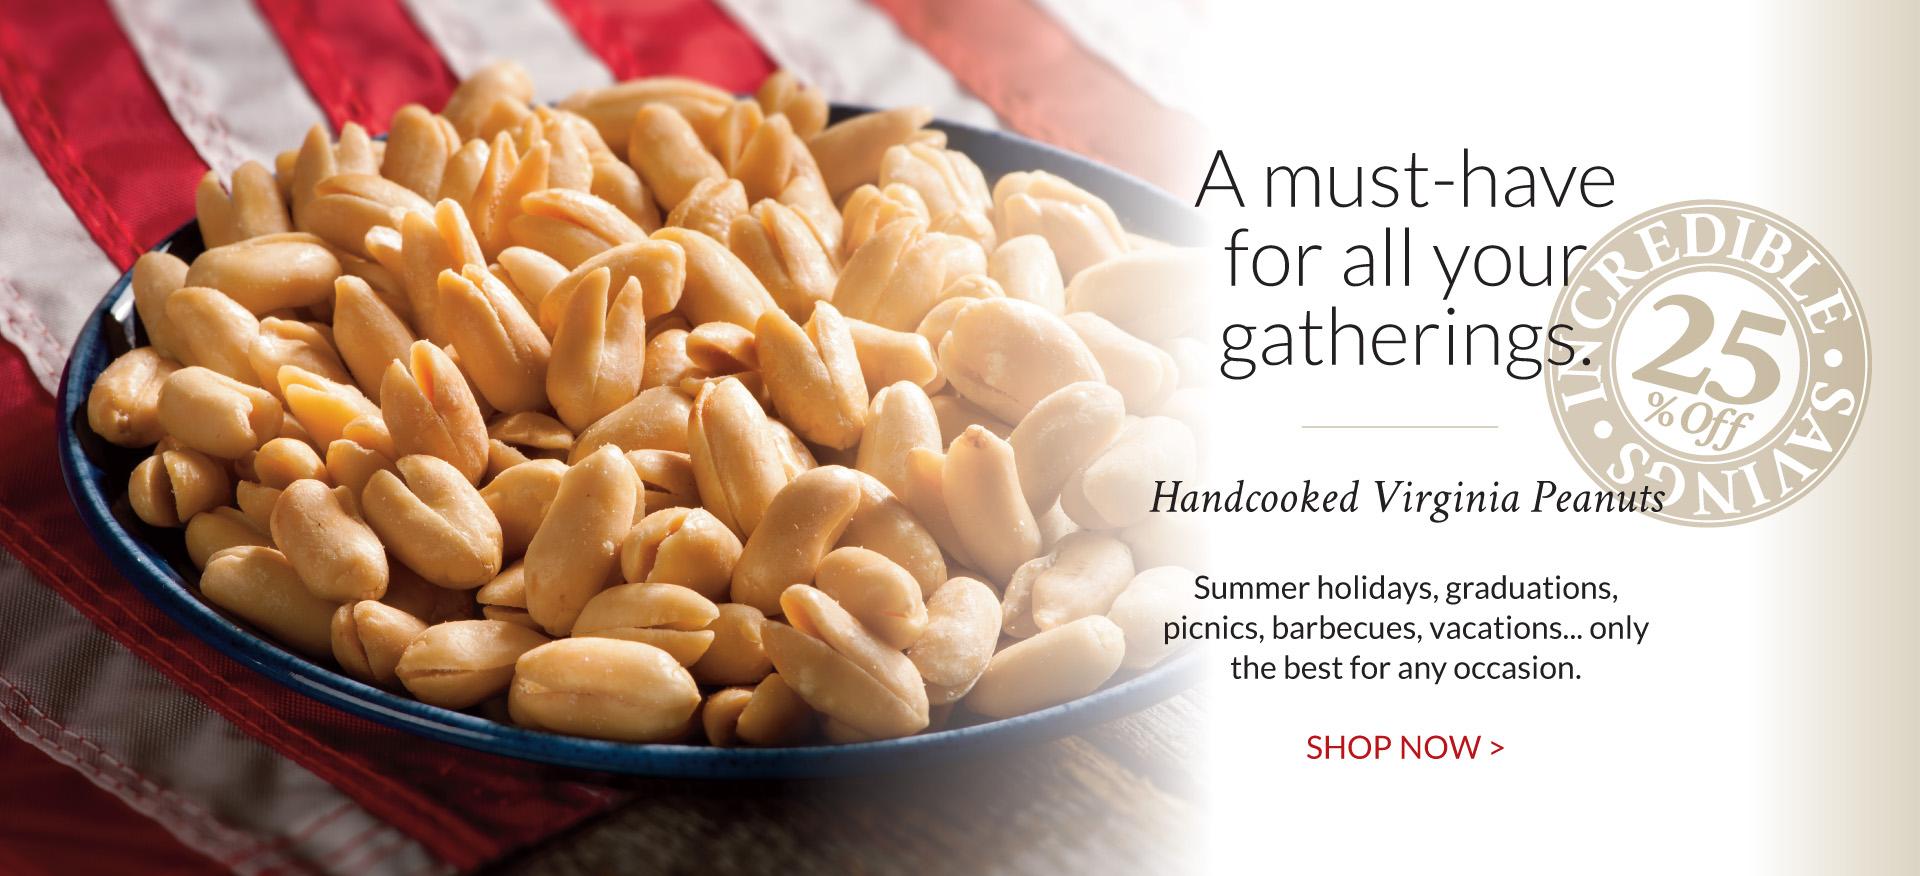 Handcooked Virginia Peanuts - The Peanut Shop of Williamsburg